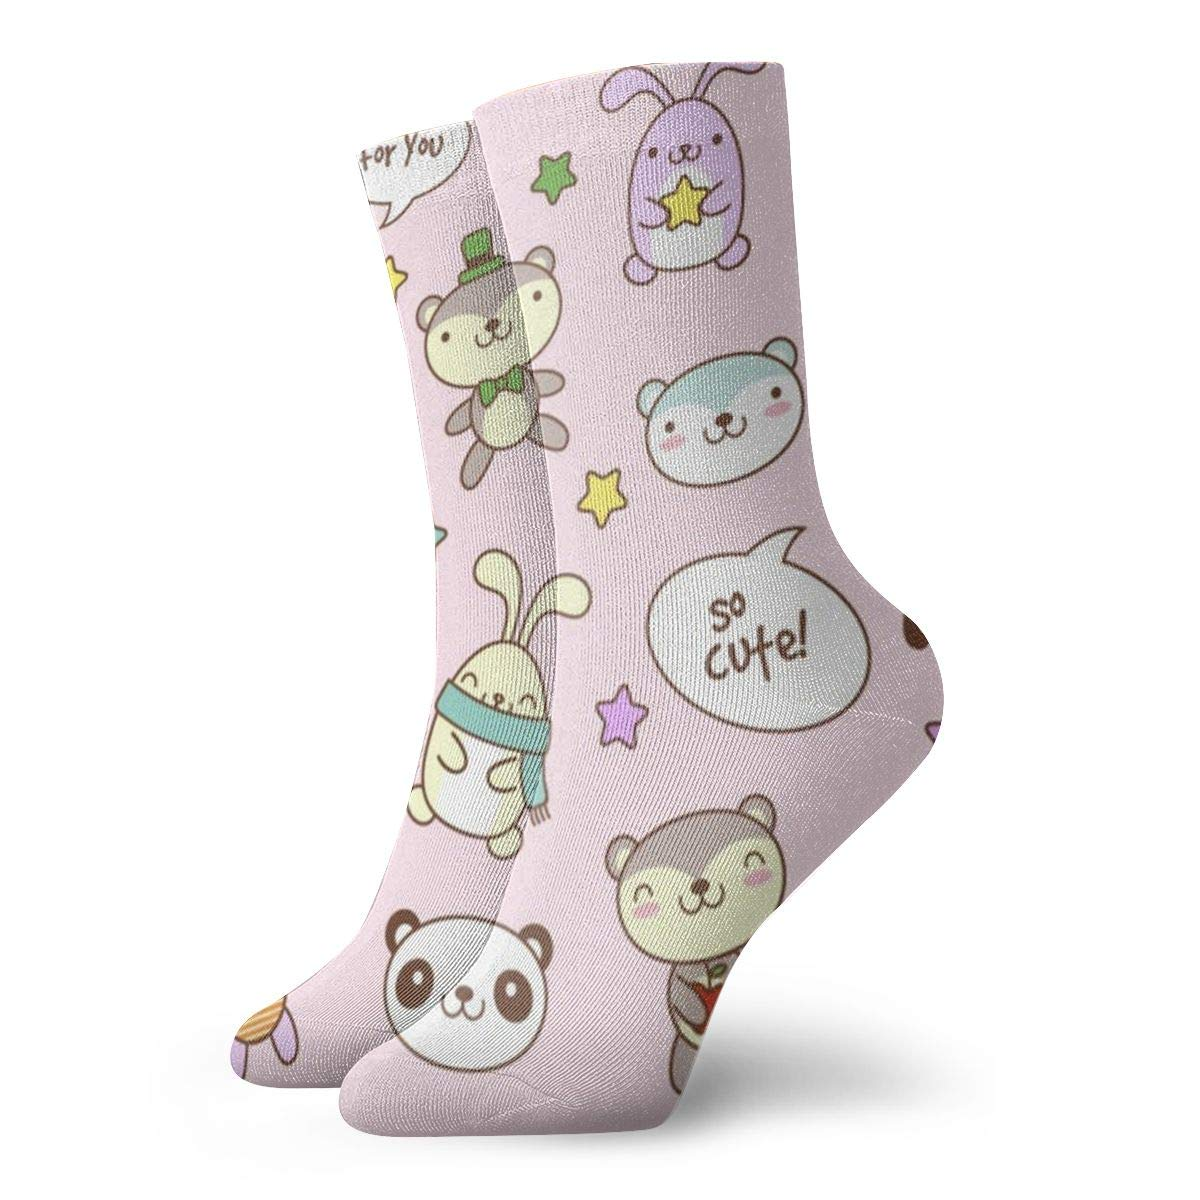 Teddy-bear-bunny Unisex Funny Casual Crew Socks Athletic Socks For Boys Girls Kids Teenagers